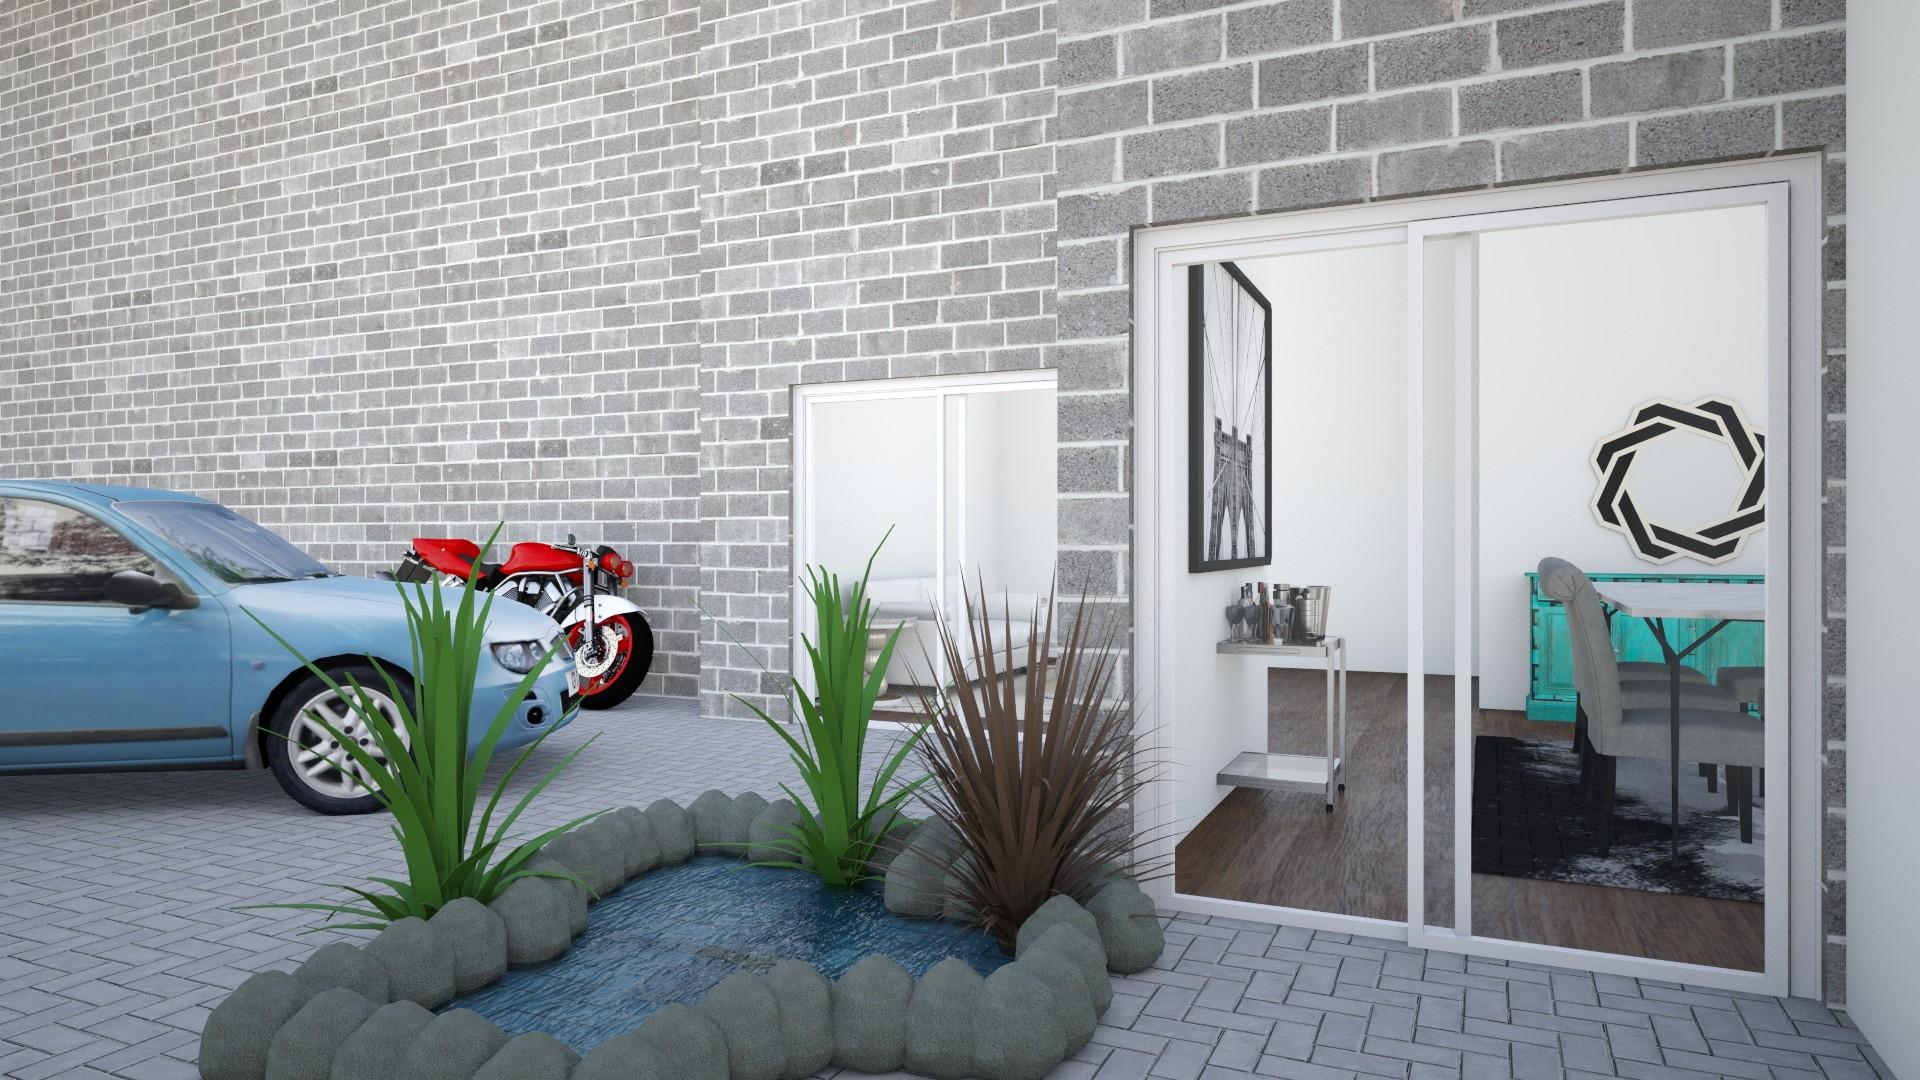 Courtyard - by Khyra